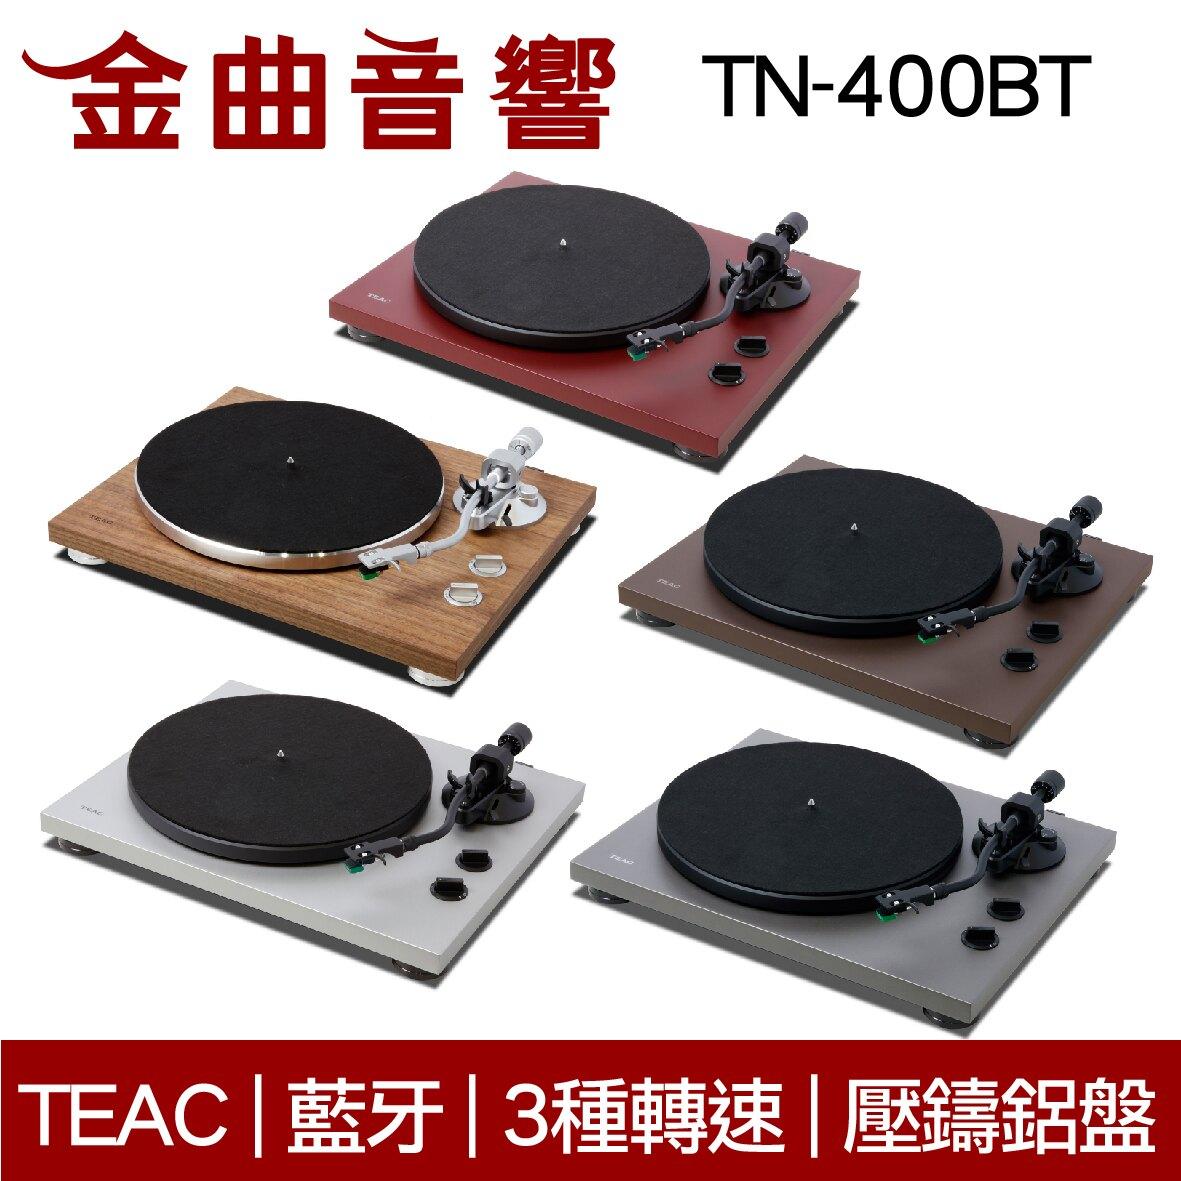 TEAC TN-400BT 霧面銀 藍牙 黑膠 類比 唱盤 | 金曲音響